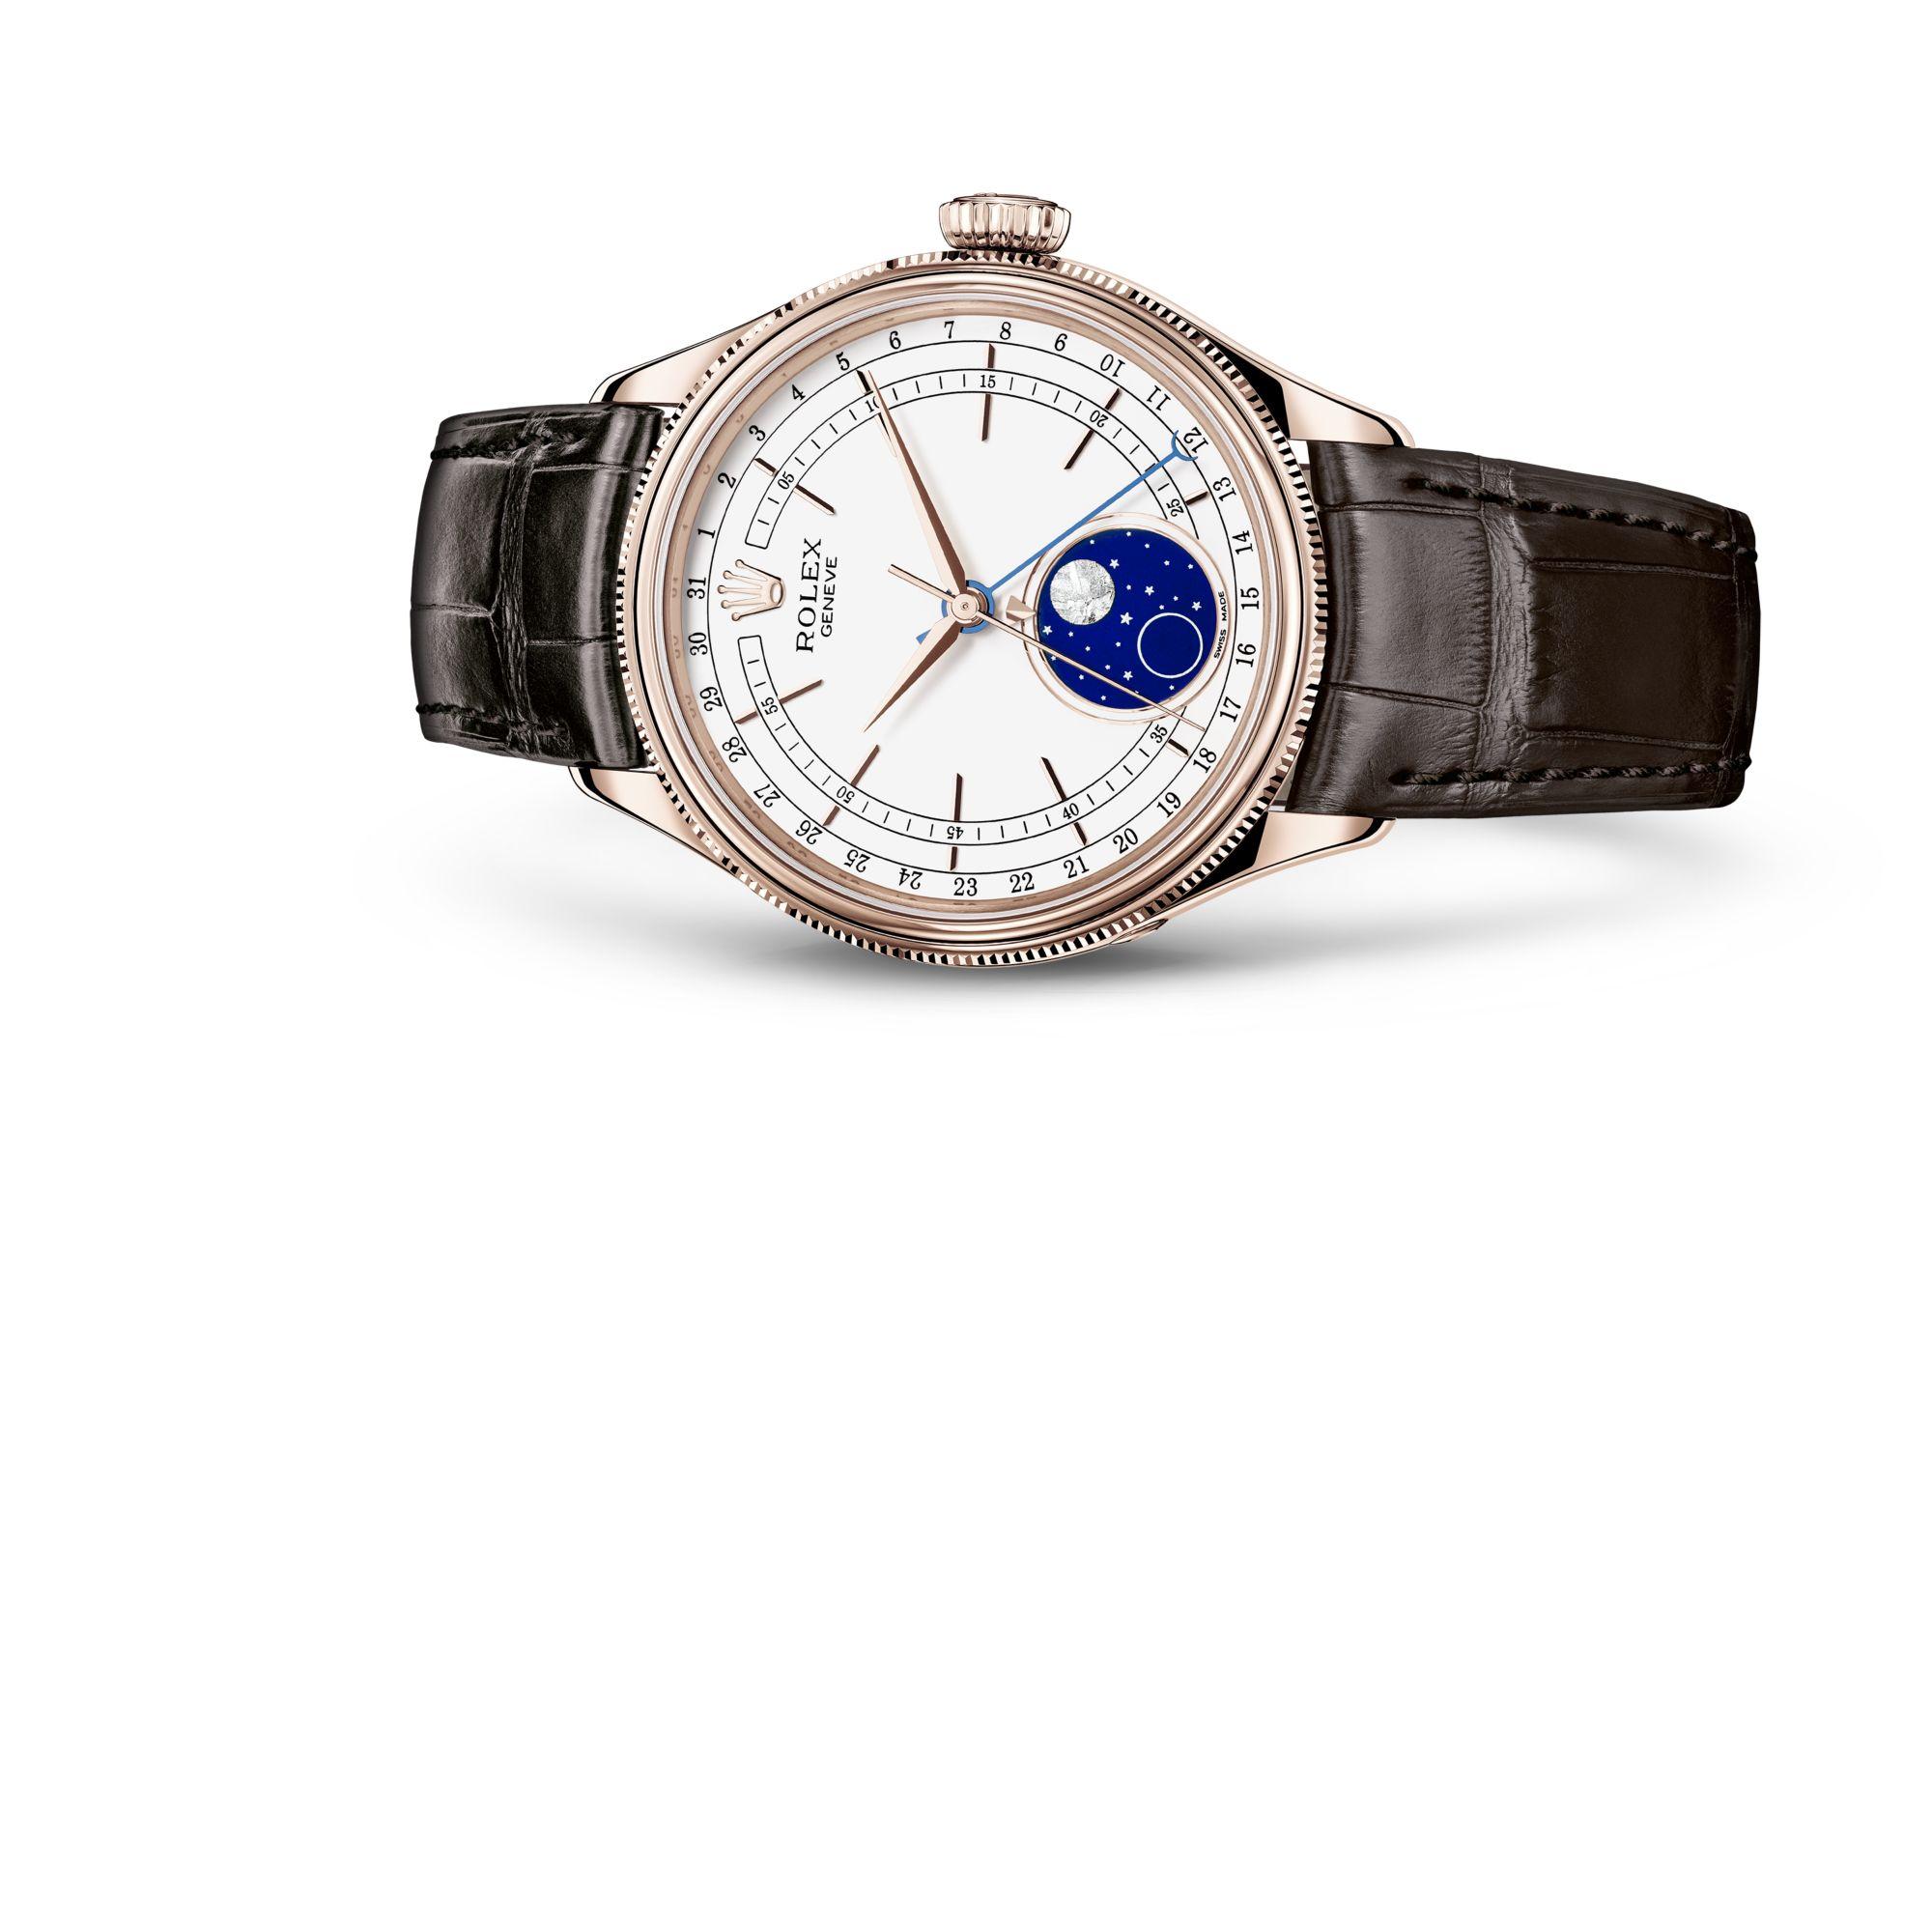 Rolex Cellini Moonphase M50535-0002